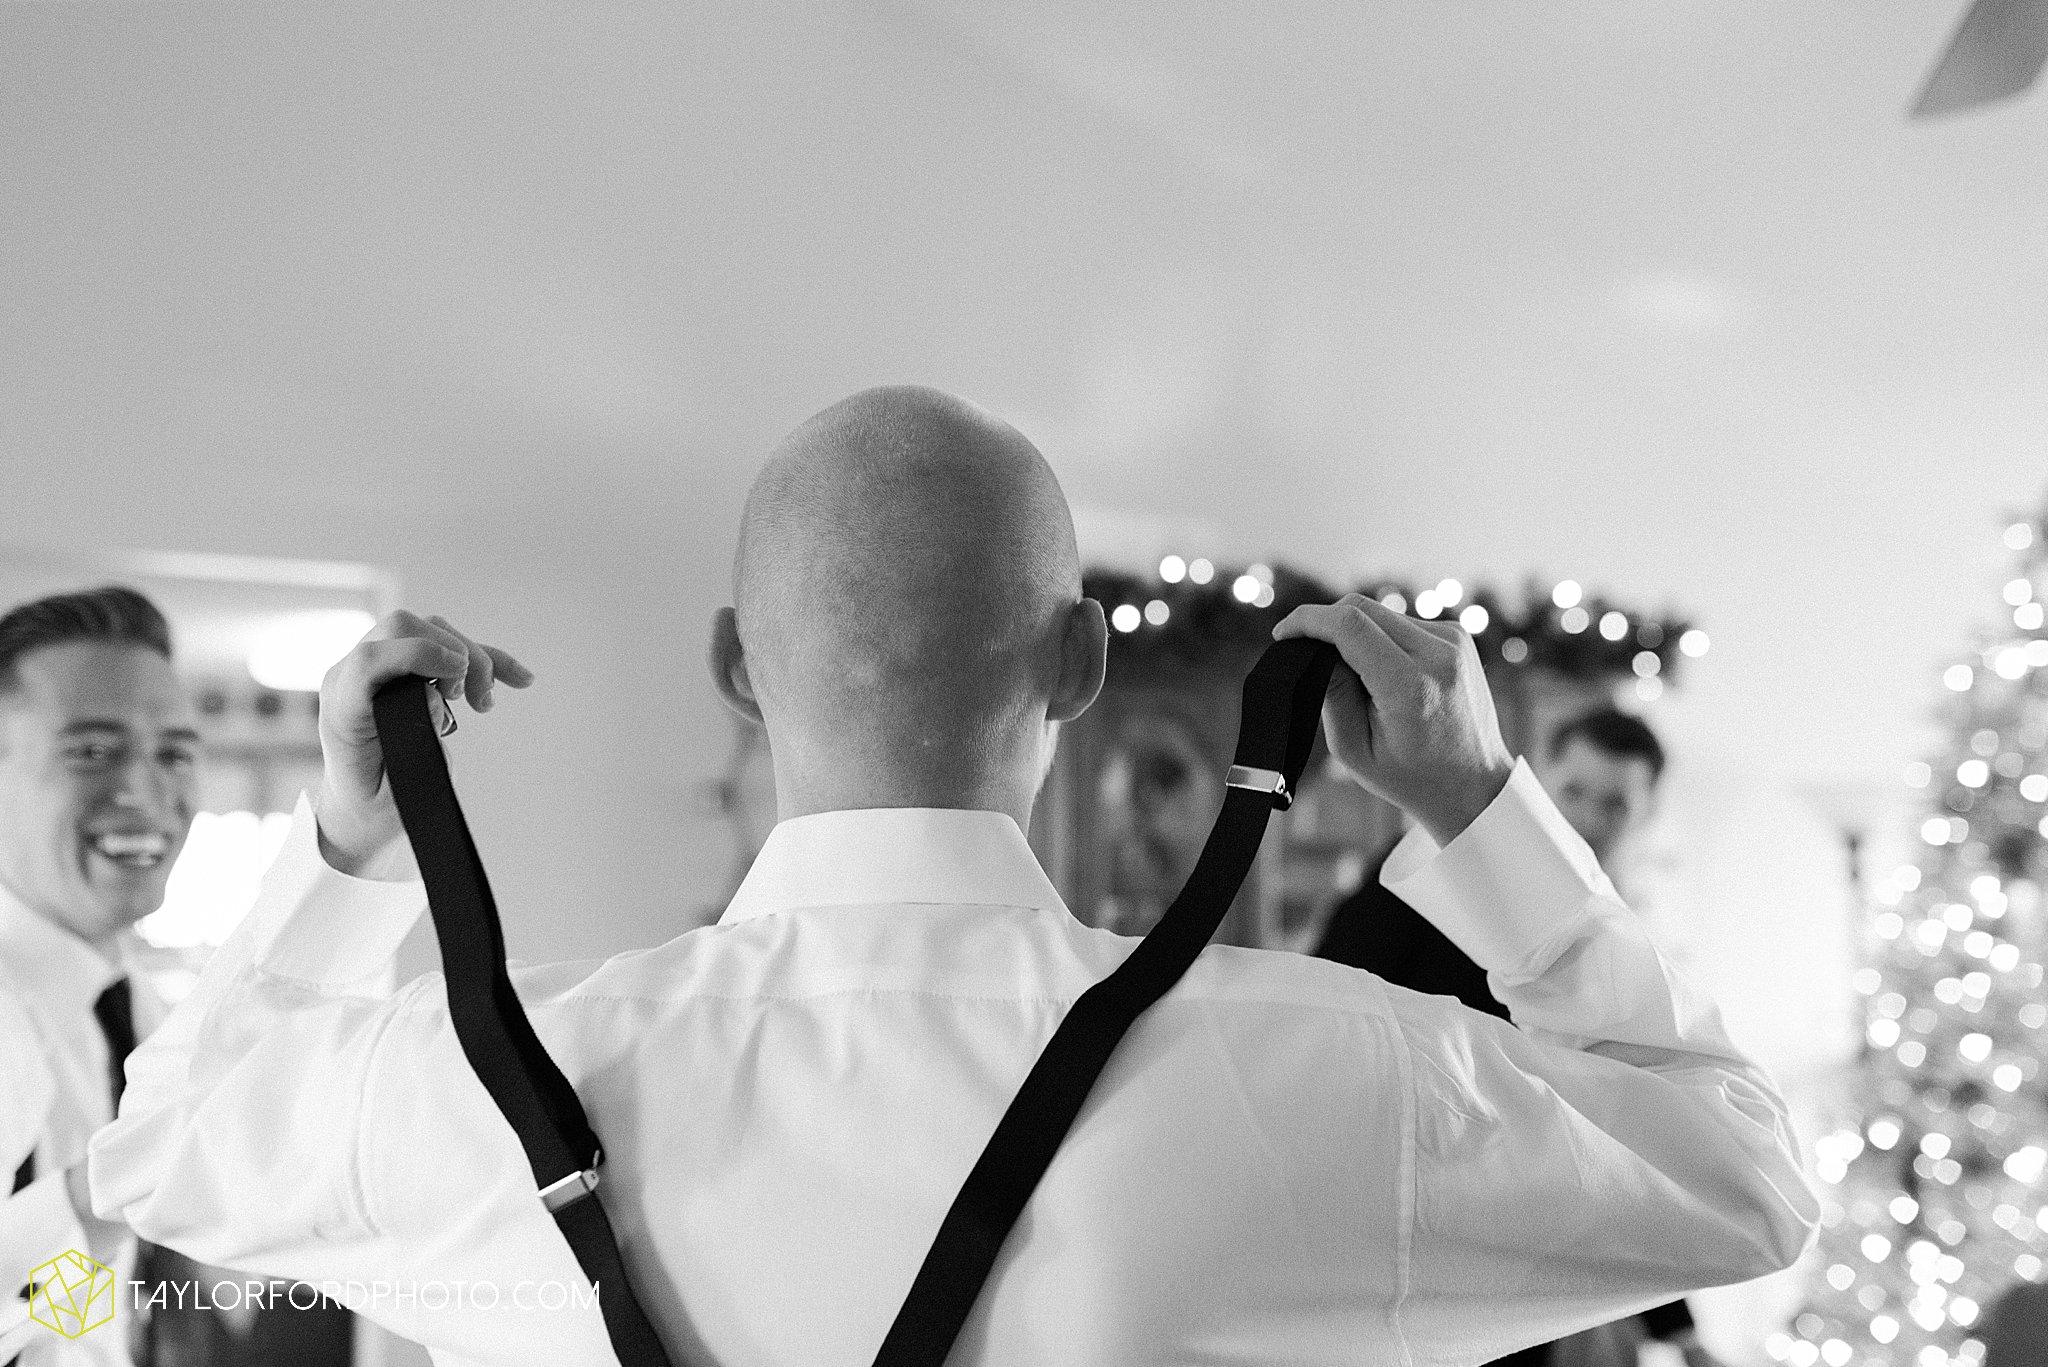 van-wert-ohio-first-united-methodist-downtown-van-wert-county-jr-fair-building-reception-winter-christmas-wedding-photographer-taylor-ford-hirschy-photographer-taylor-ford-hirschy-photographer_1904.jpg